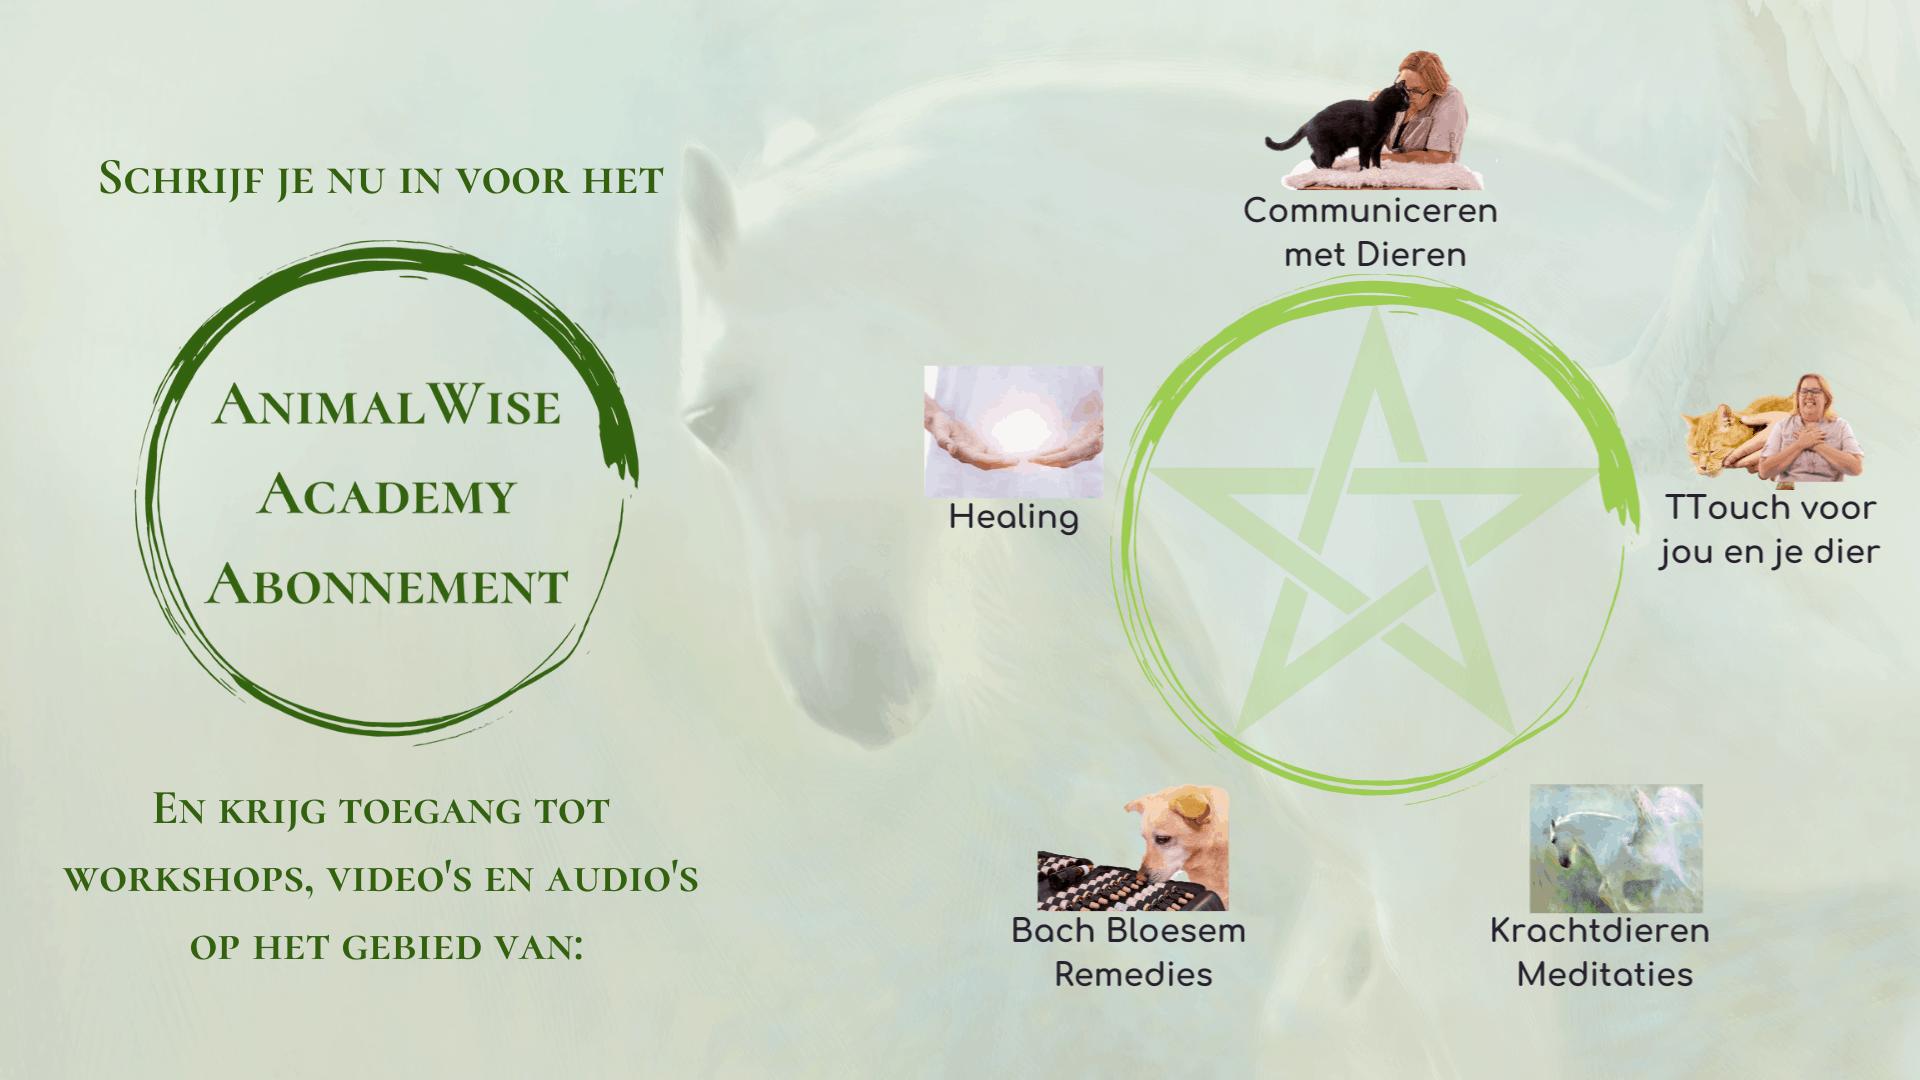 Het AnimalWise Academy Abonnement (pc)